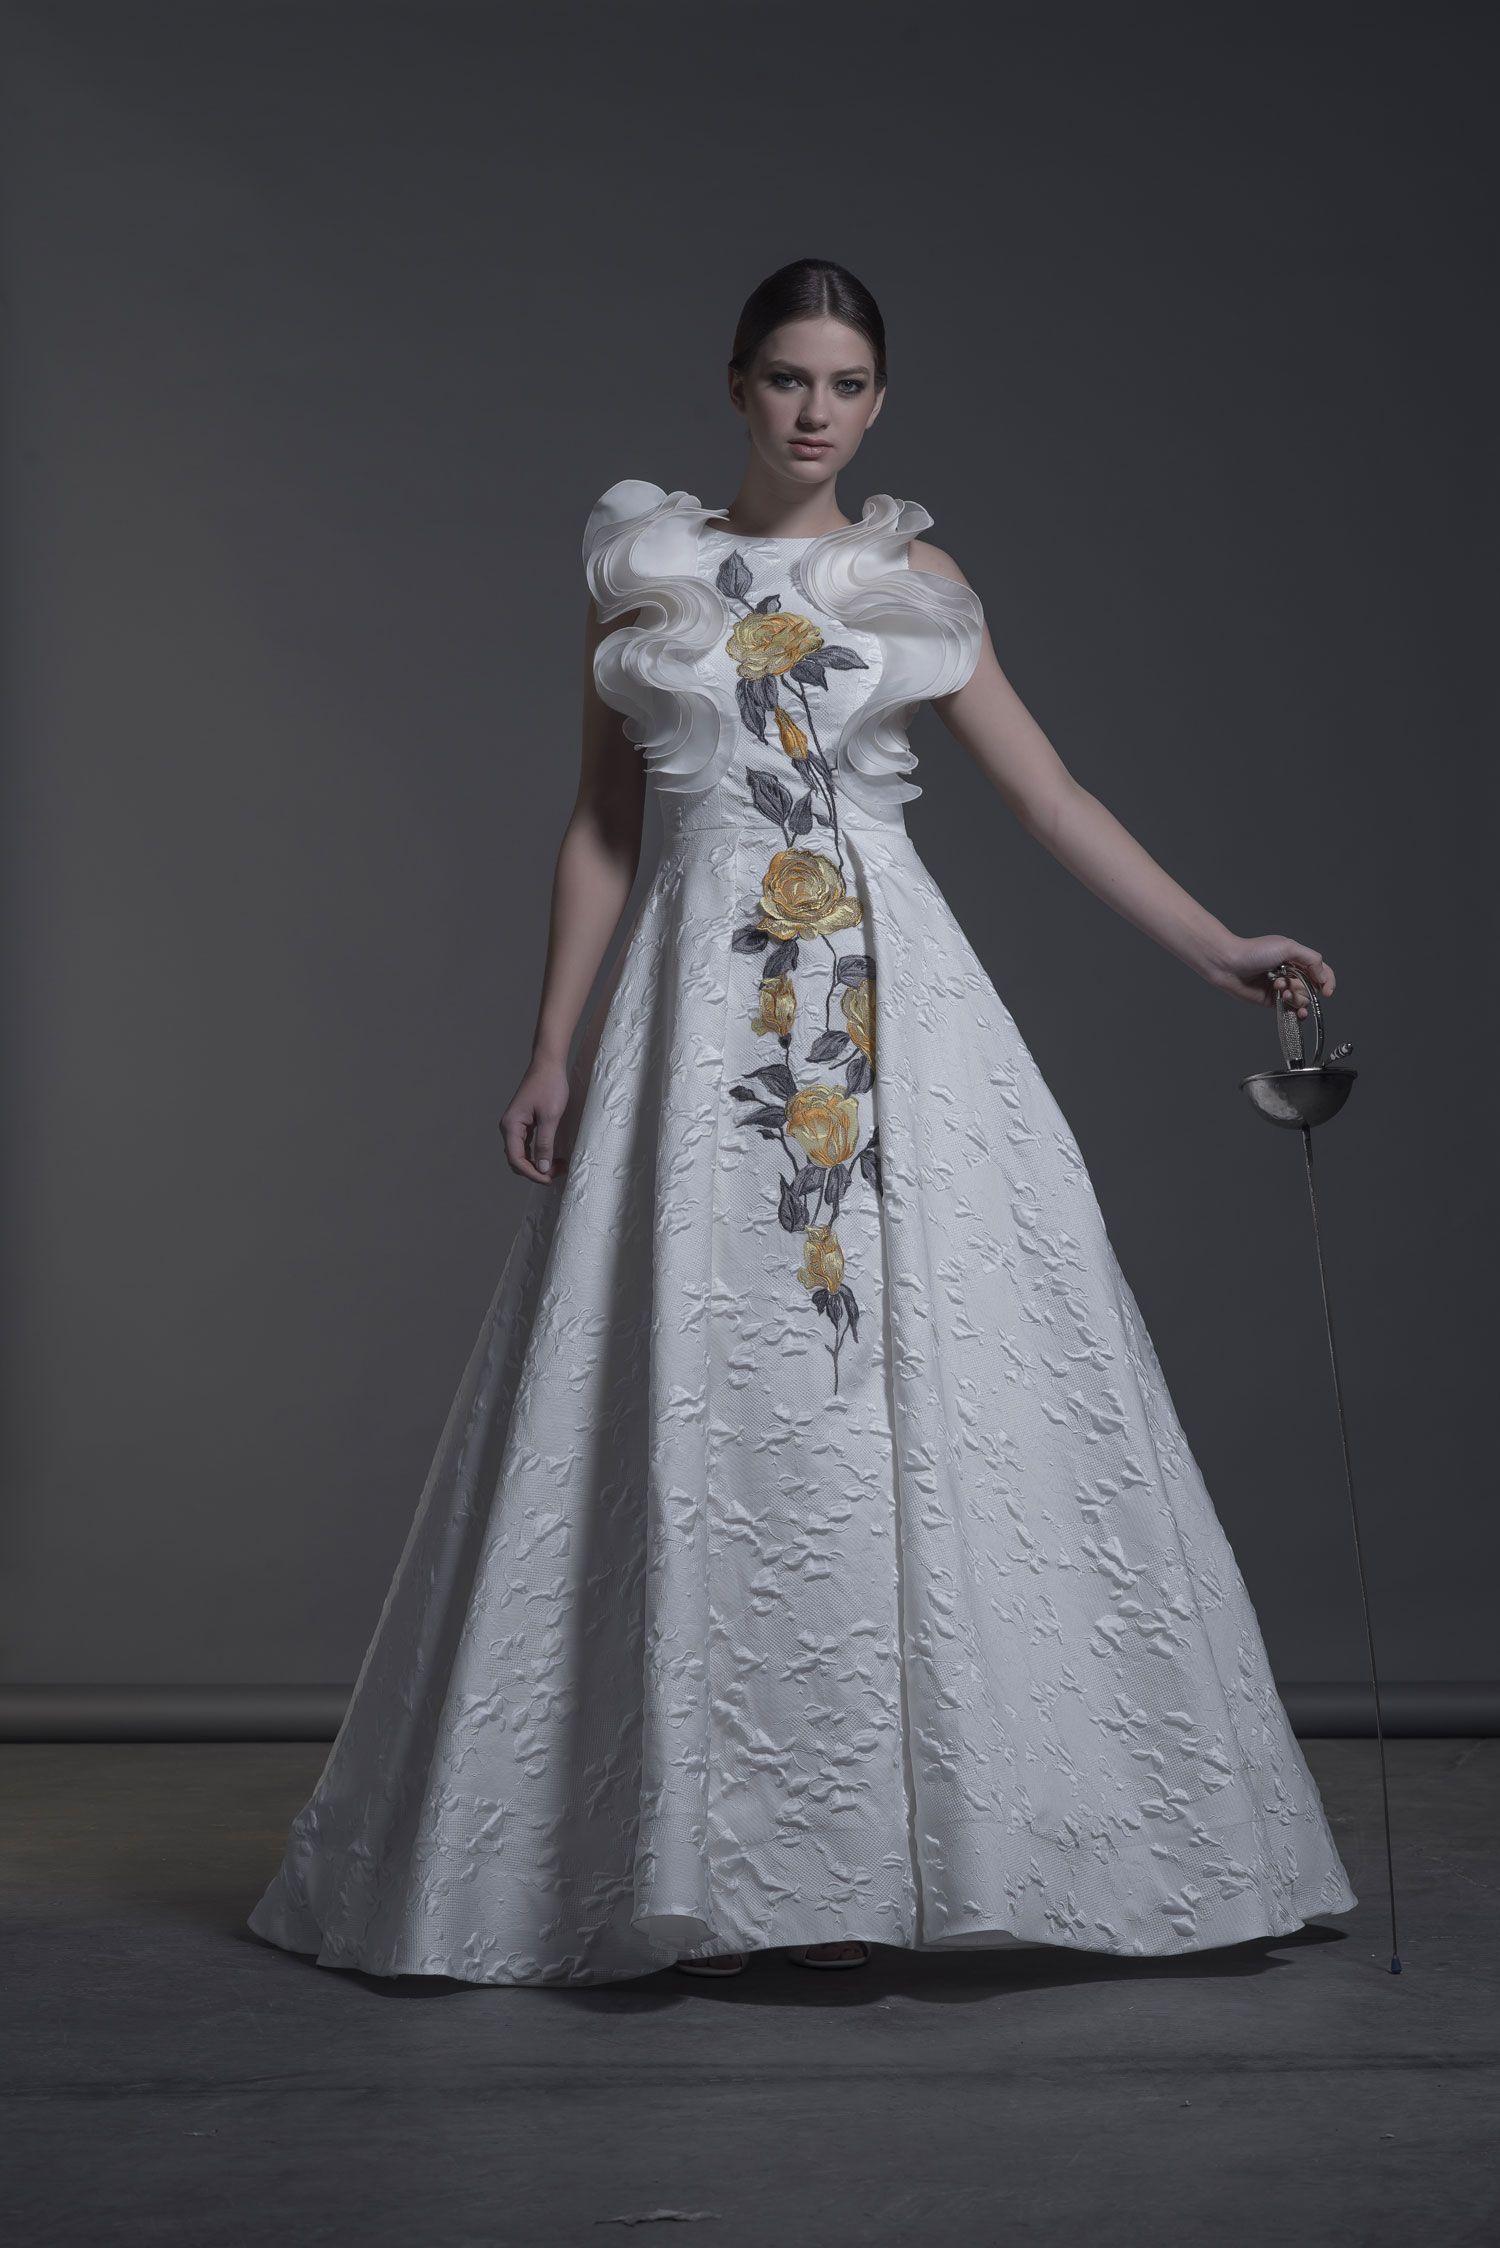 ba6c7e26a 205-VARESE - Colección Otoño Invierno 2016 17.  vestidos  fiesta  moda   fashion  mujer  invitada  invitadaperfecta  madrina  dress